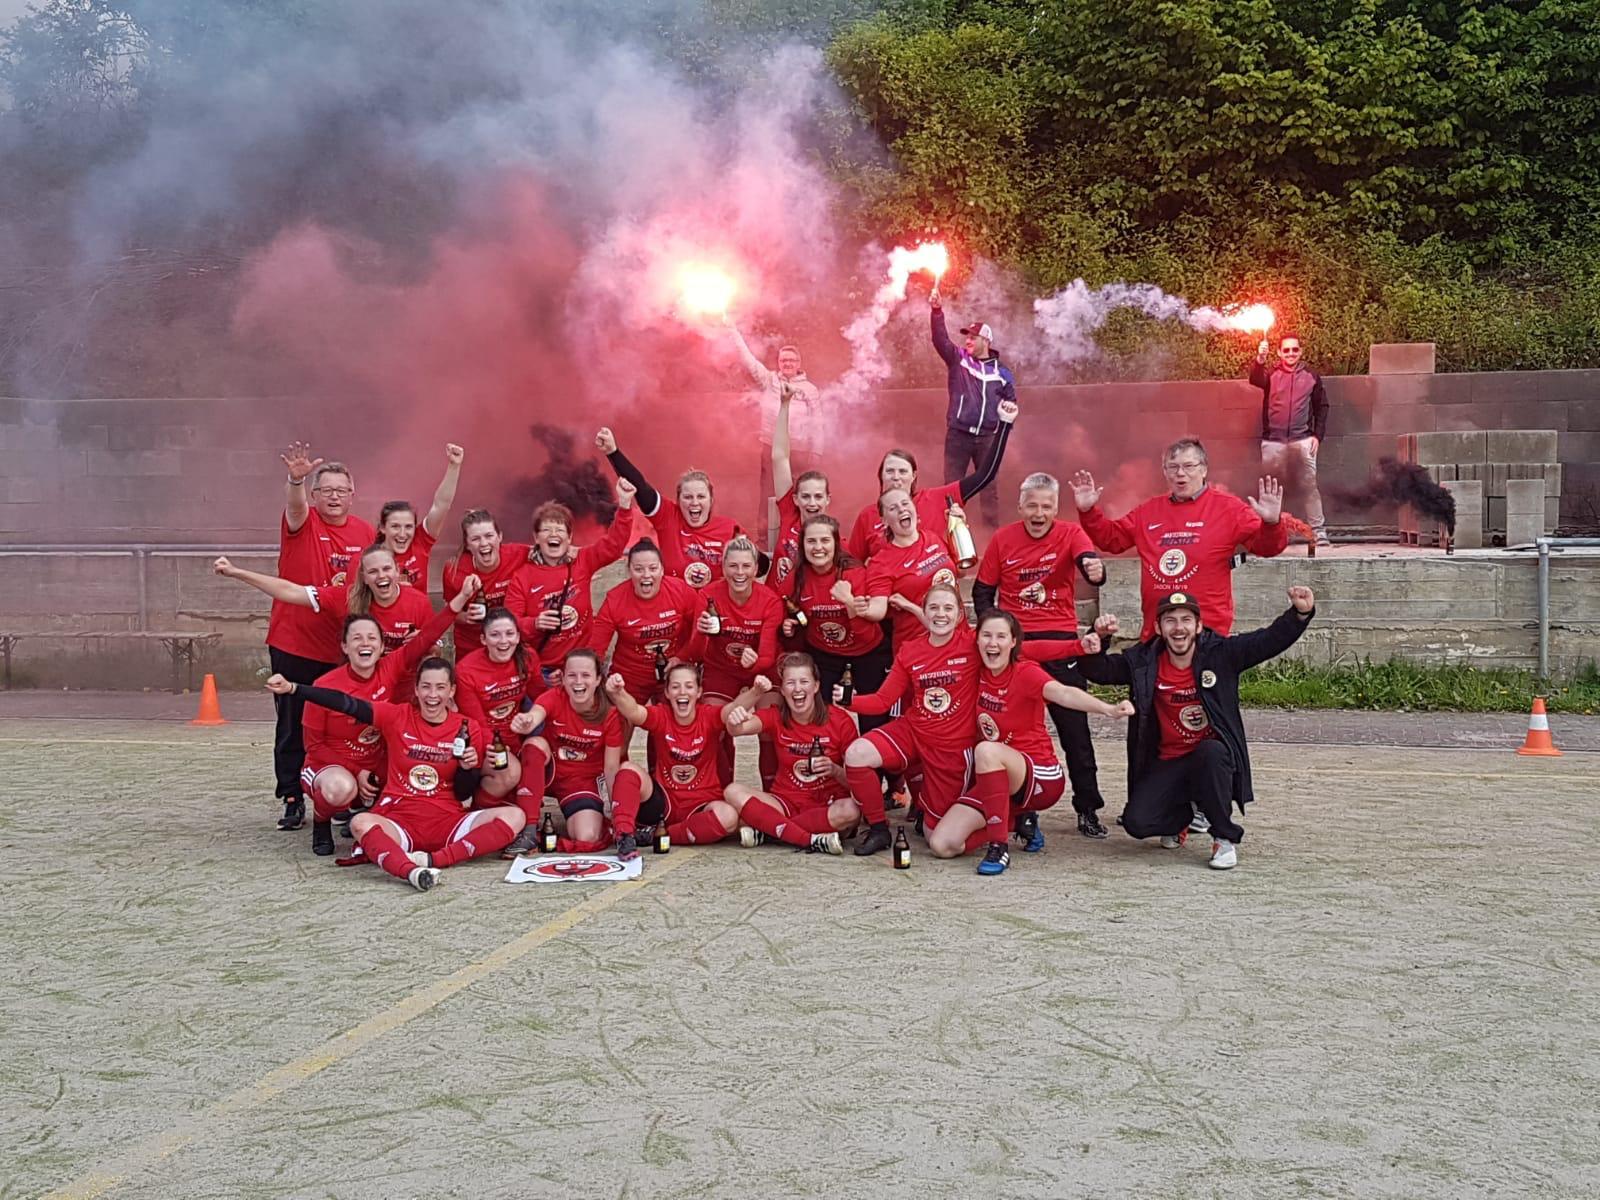 Frauen feiern Bezirksligameistertitel 2018/2019!